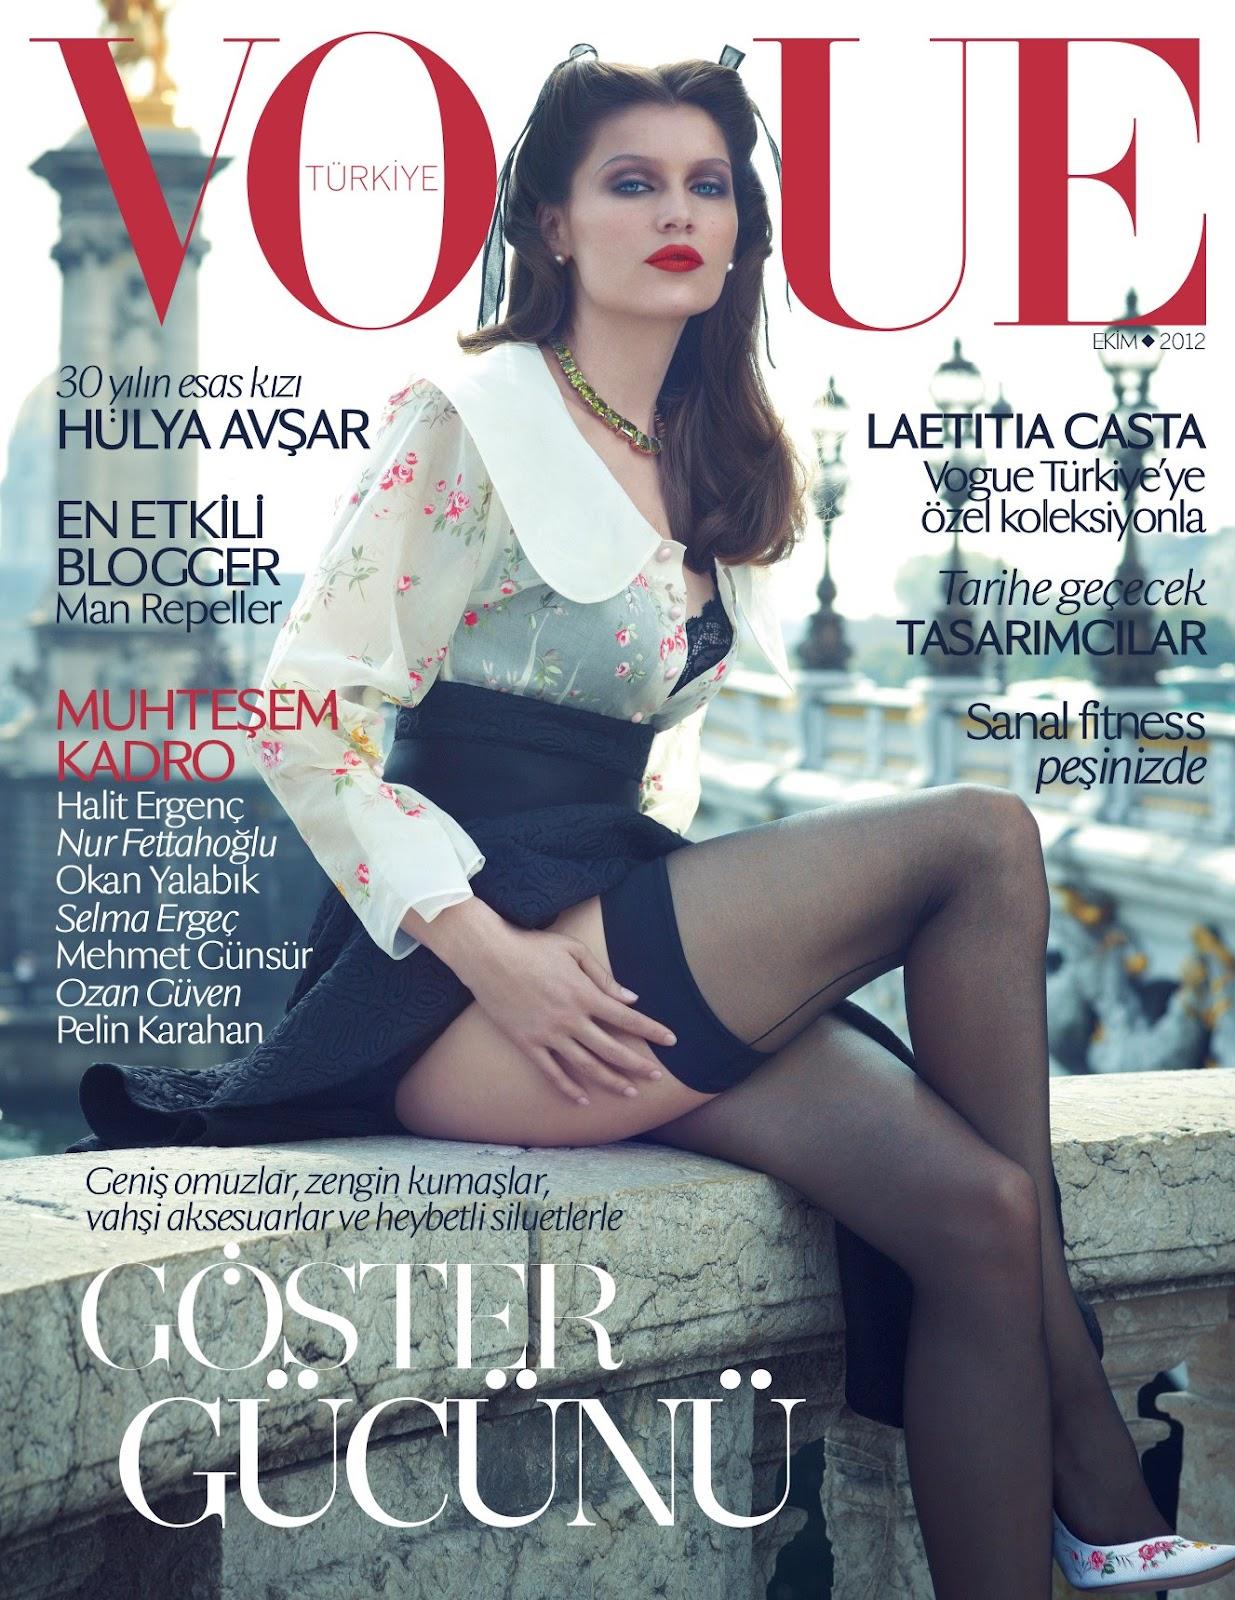 http://1.bp.blogspot.com/-G8dtiSU5J48/UGSil2PO70I/AAAAAAAAcy0/GuVnEoxObvo/s1600/Laetitia+Casta+by+Sean+%2526+Seng+%2528Vogue+Turkey+October+2012%2529.jpg